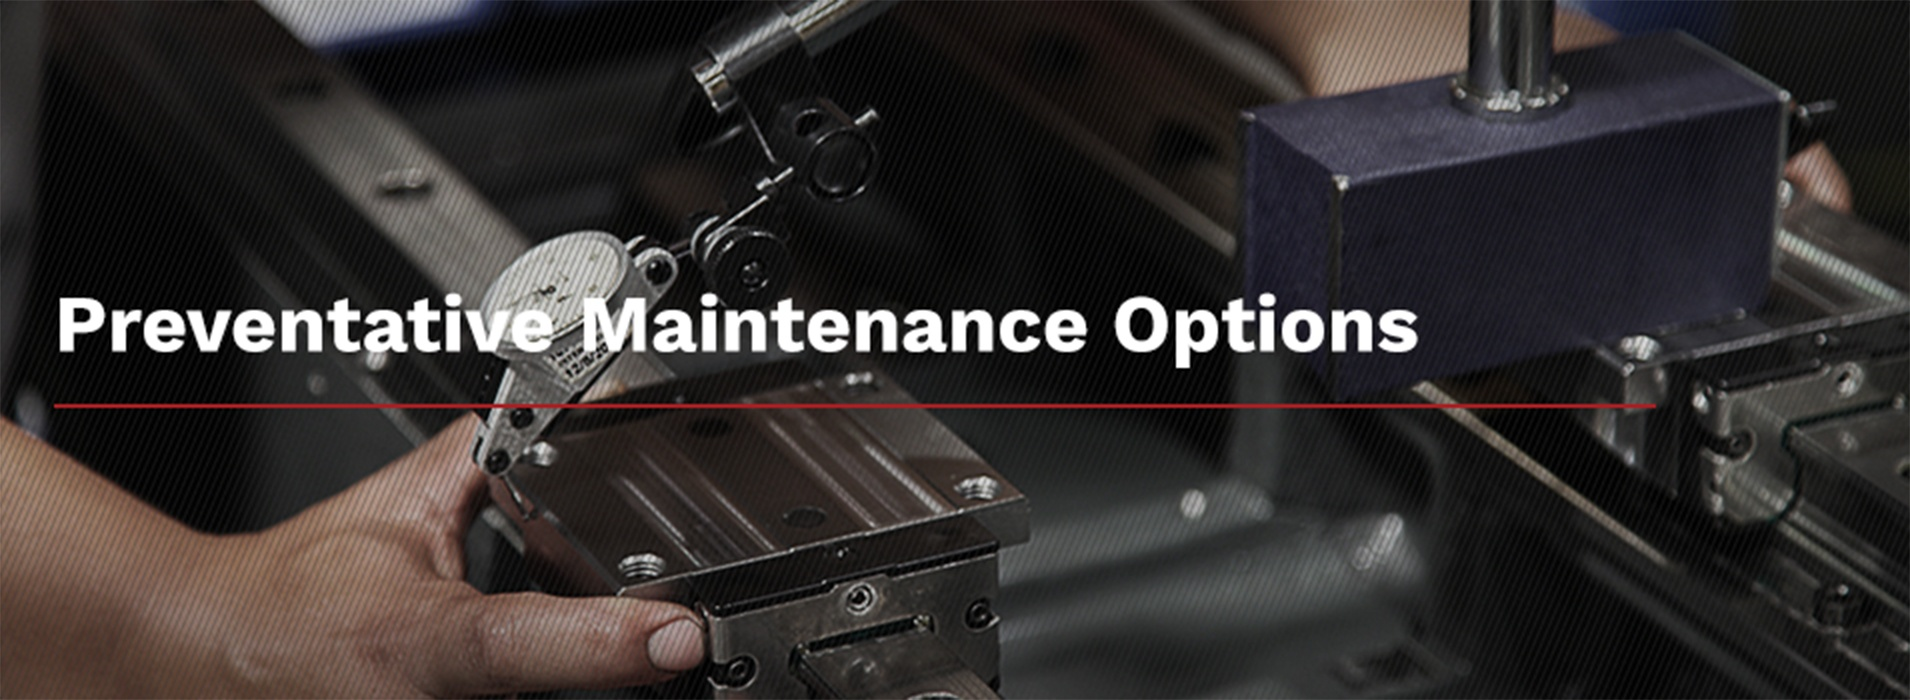 Preventative Maintenance Options.jpg